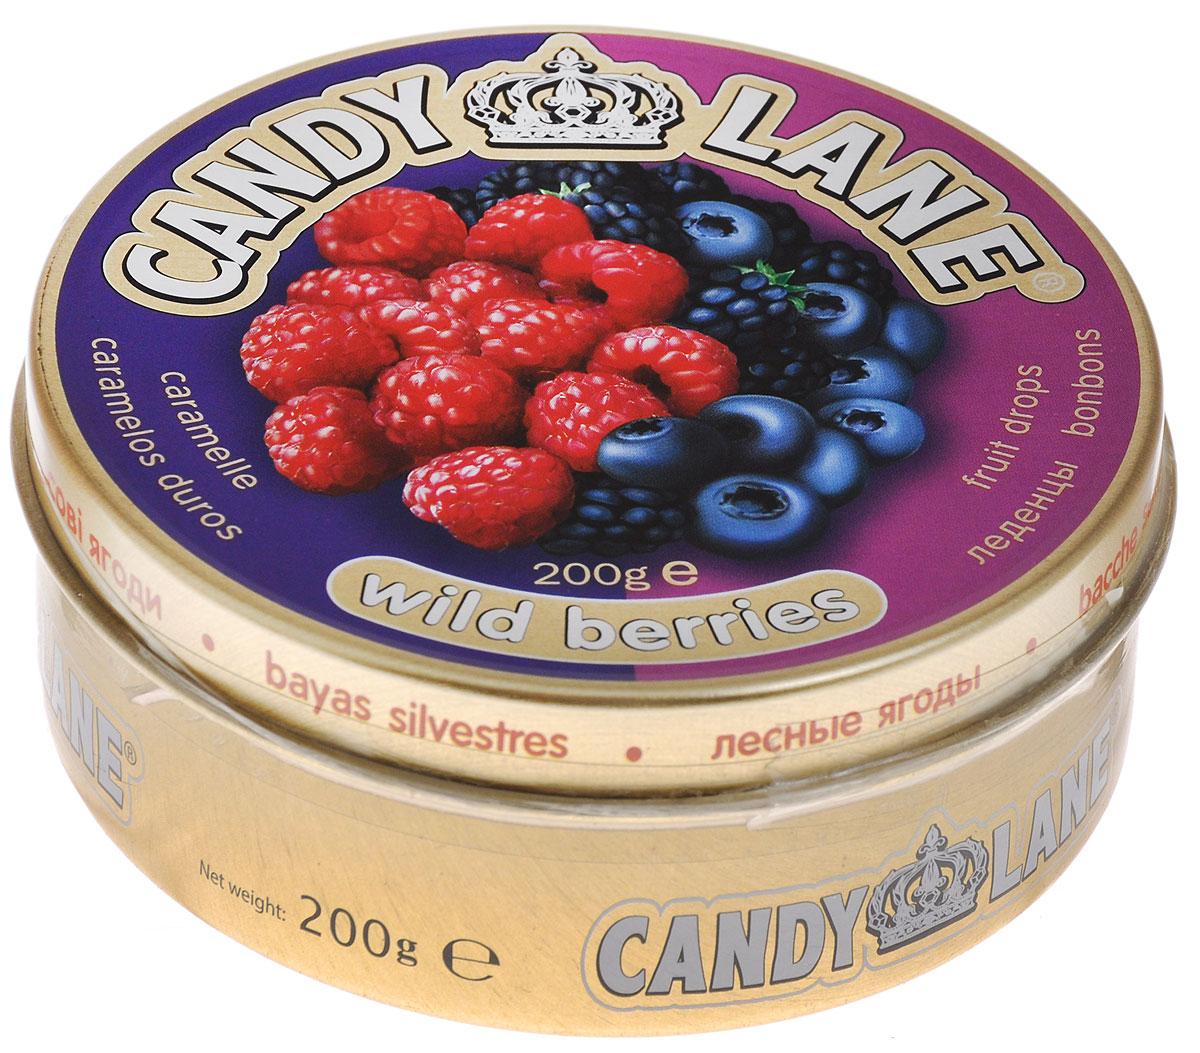 Candy Lane Лесные ягоды фруктовые леденцы, 200 г